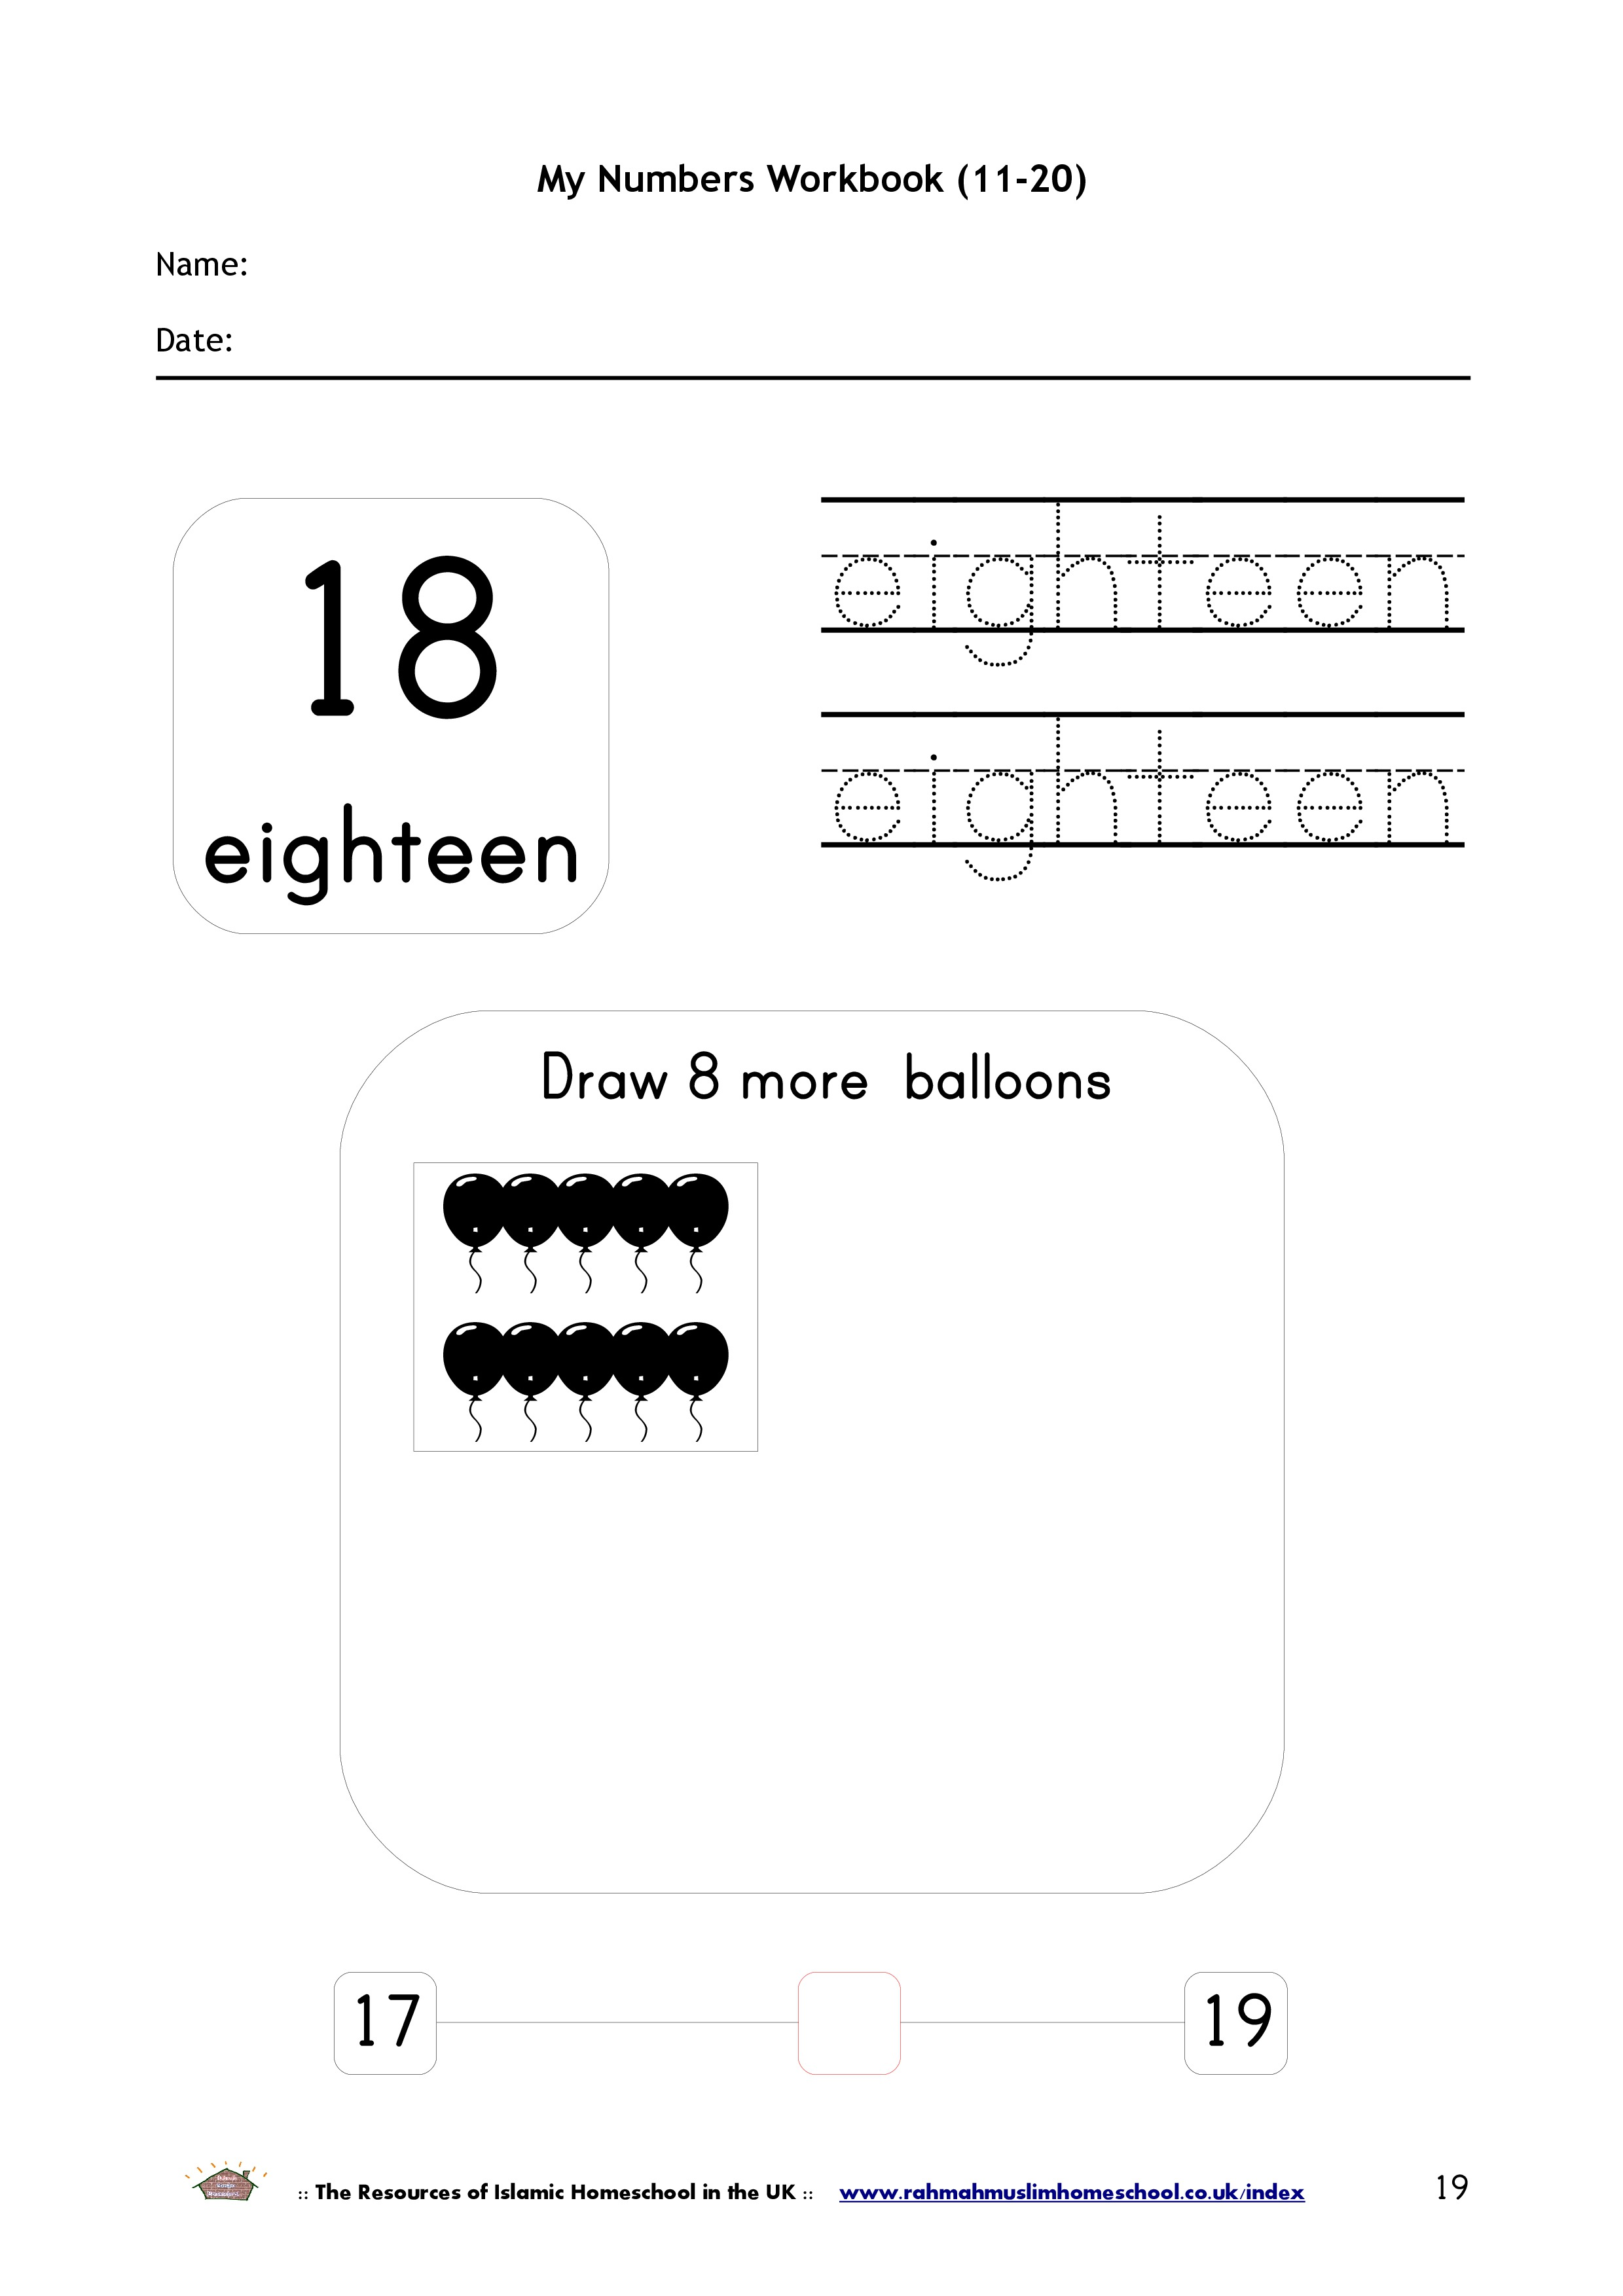 Maths My Numbers Workbook 11 20